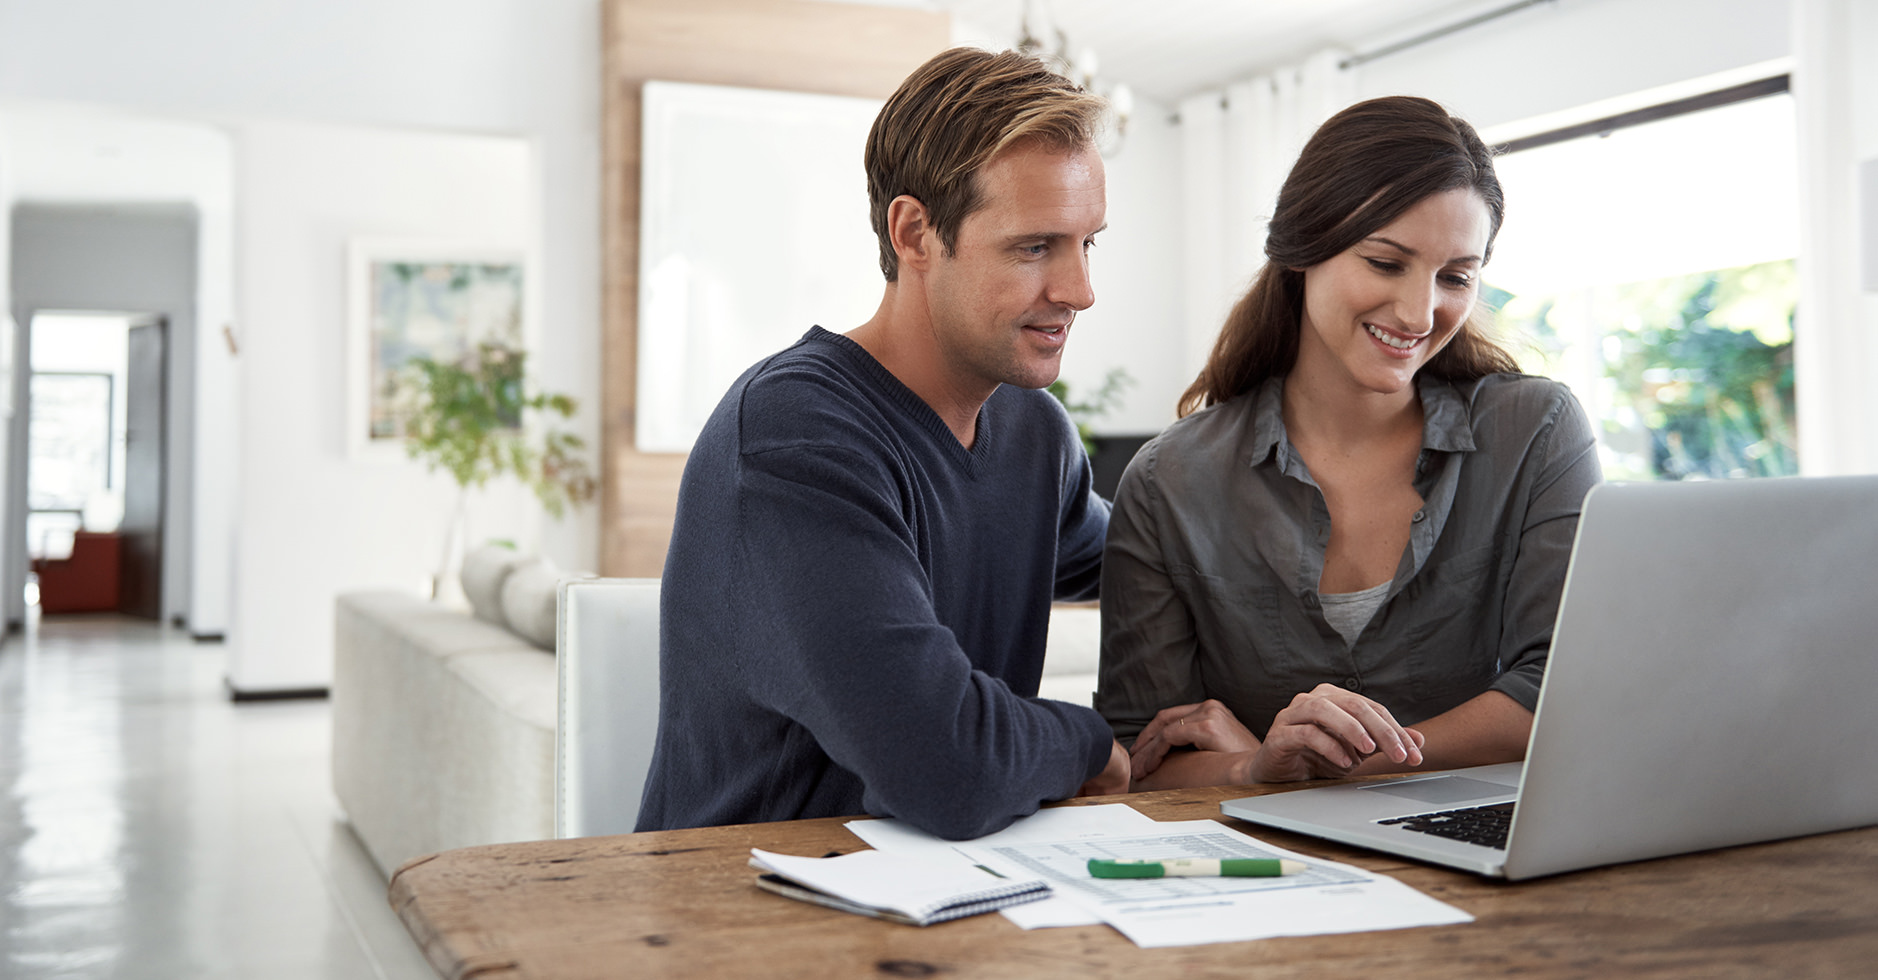 BuyingPropertySuperannuation Feature Preparing for Tax Time